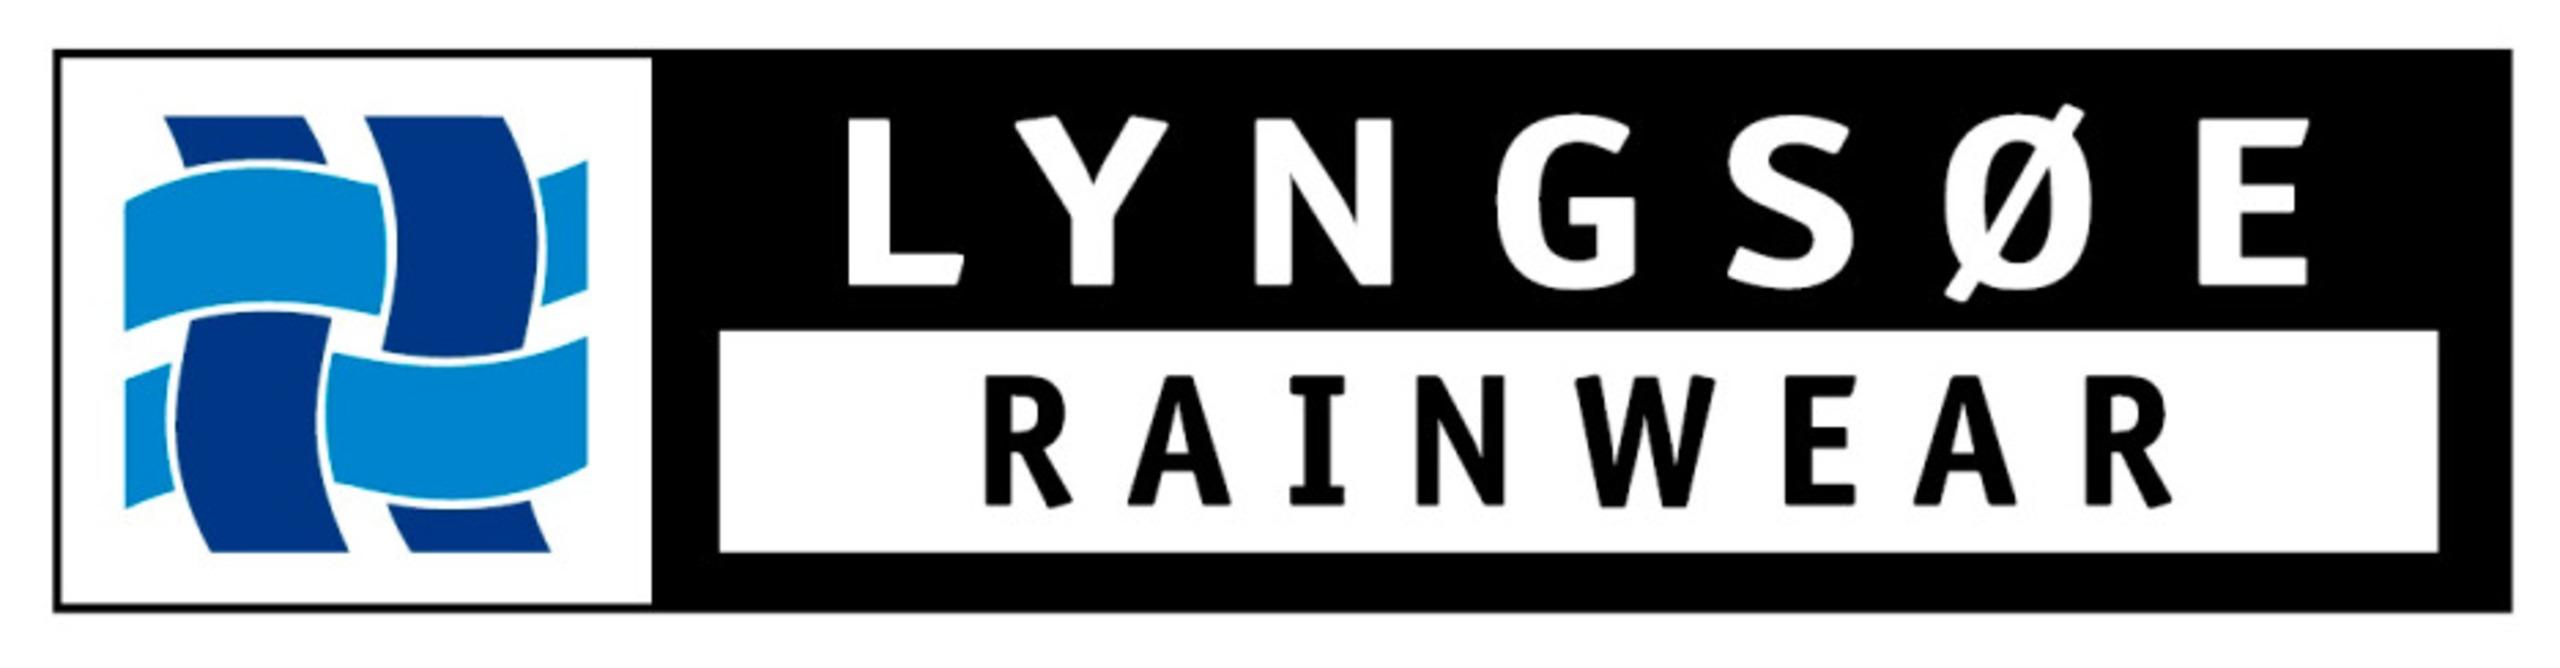 Lyngsøe Rainwear